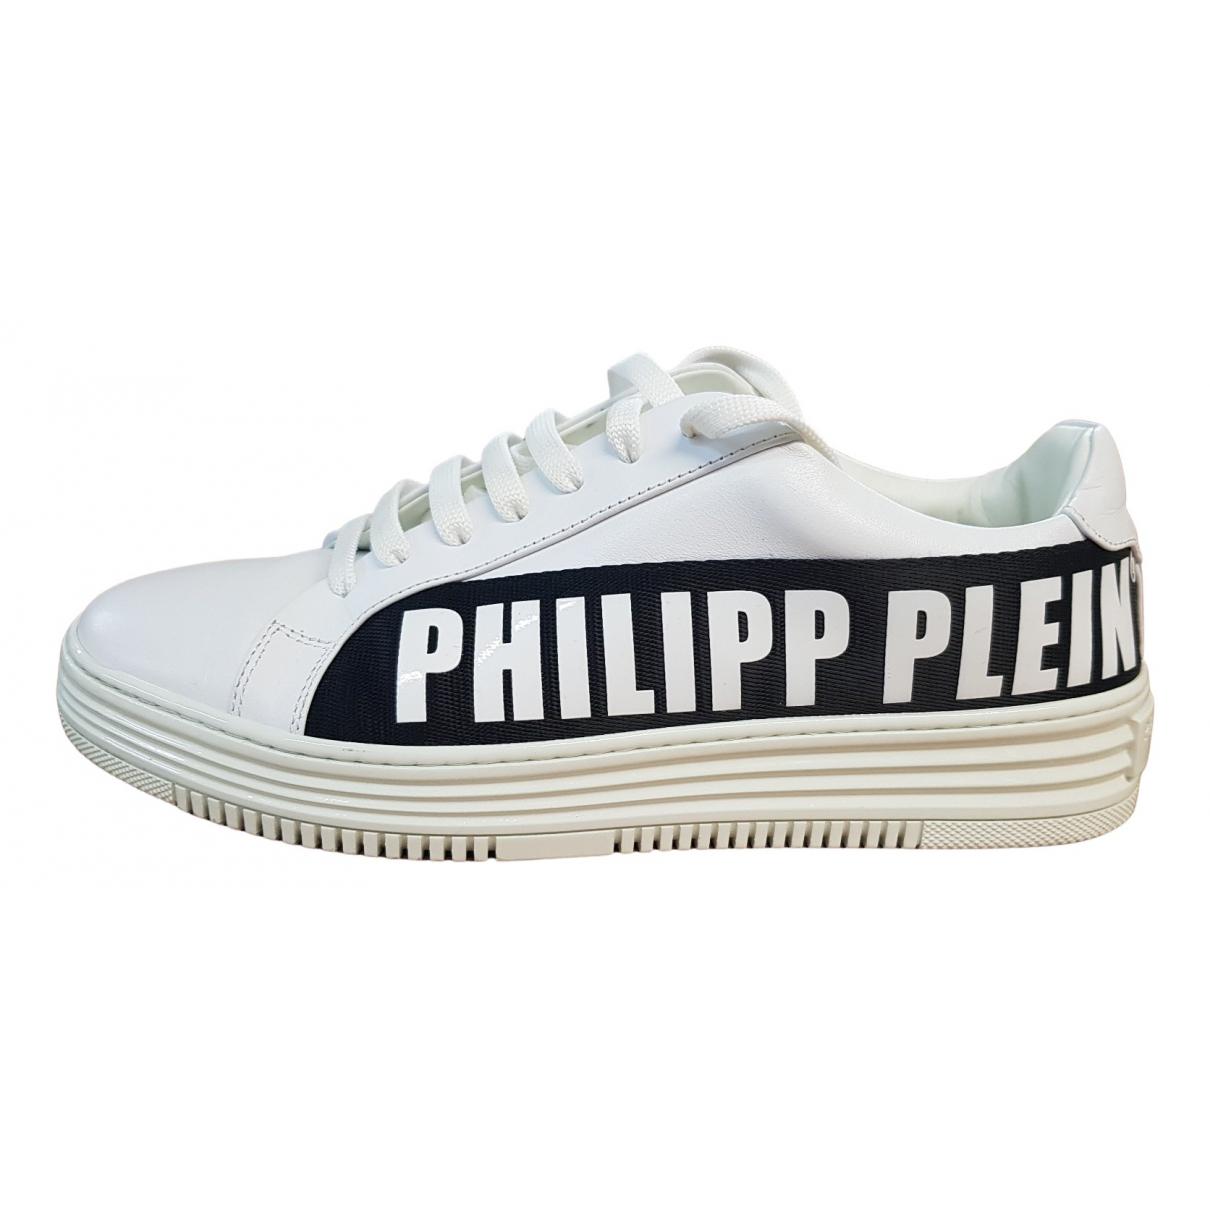 Philipp Plein Lo-Top White Leather Trainers for Men 40 EU